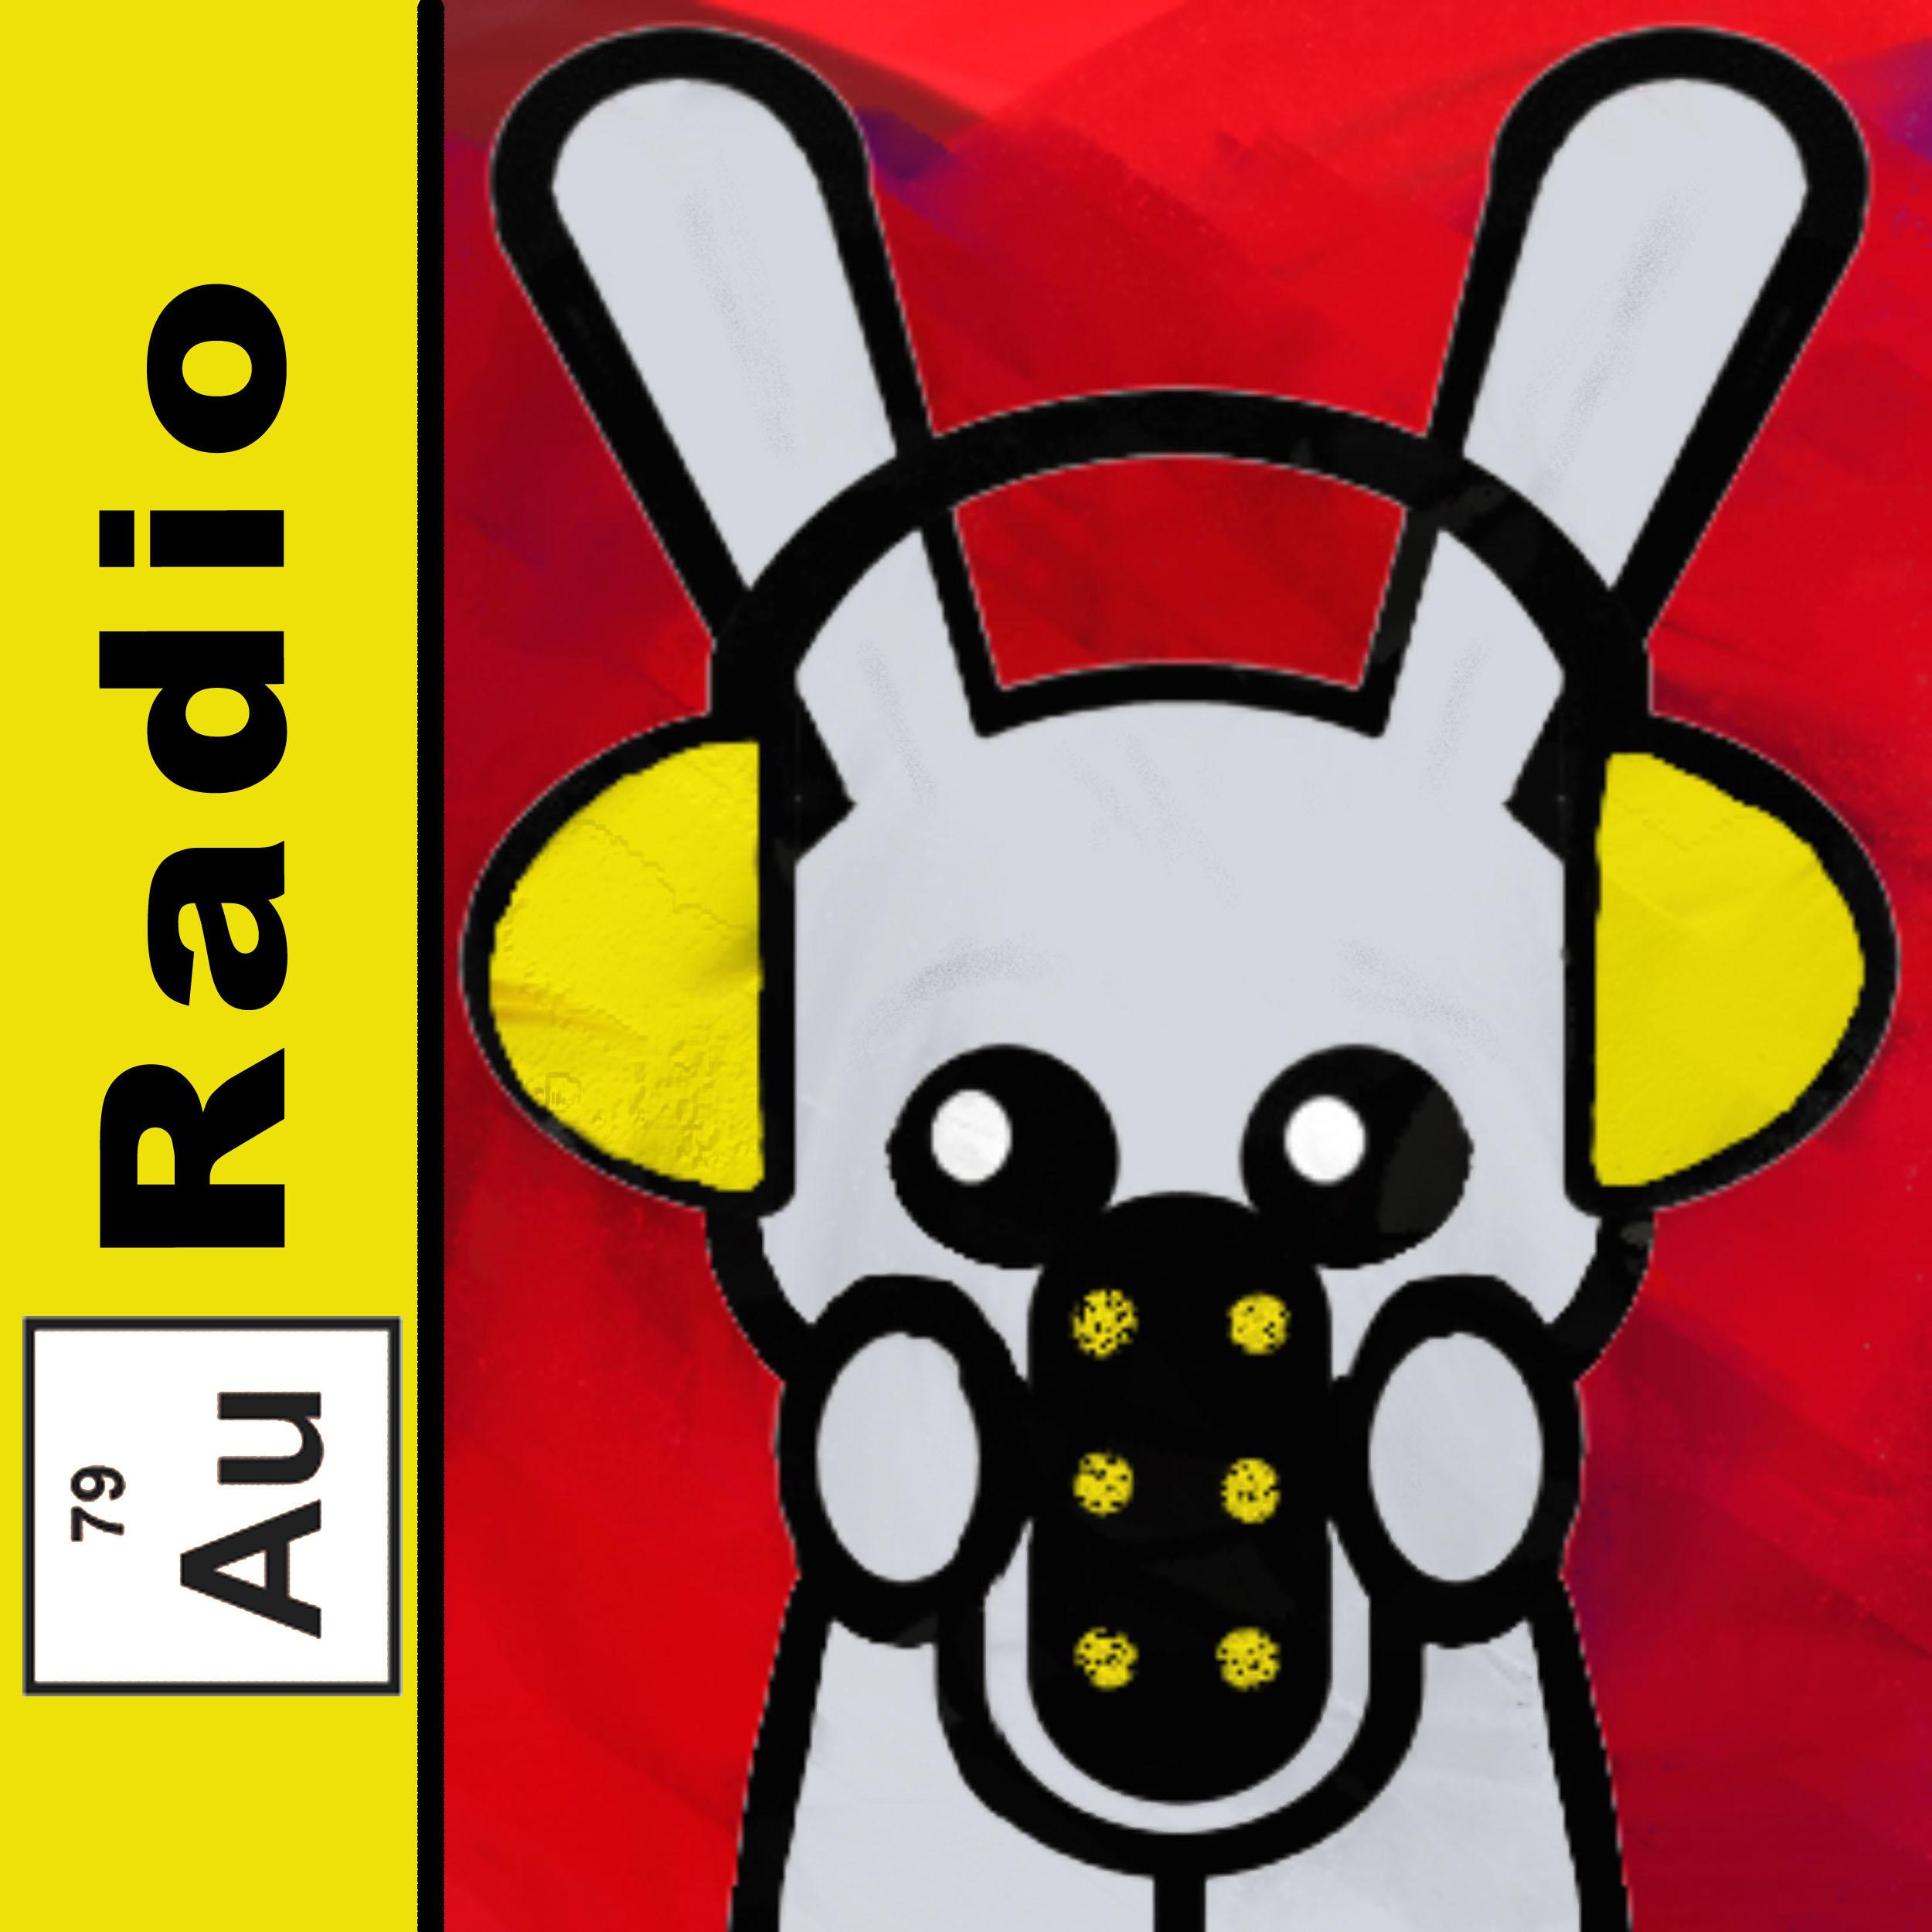 AU Radio Season 2 - Episode 42: Talking about stuff show art